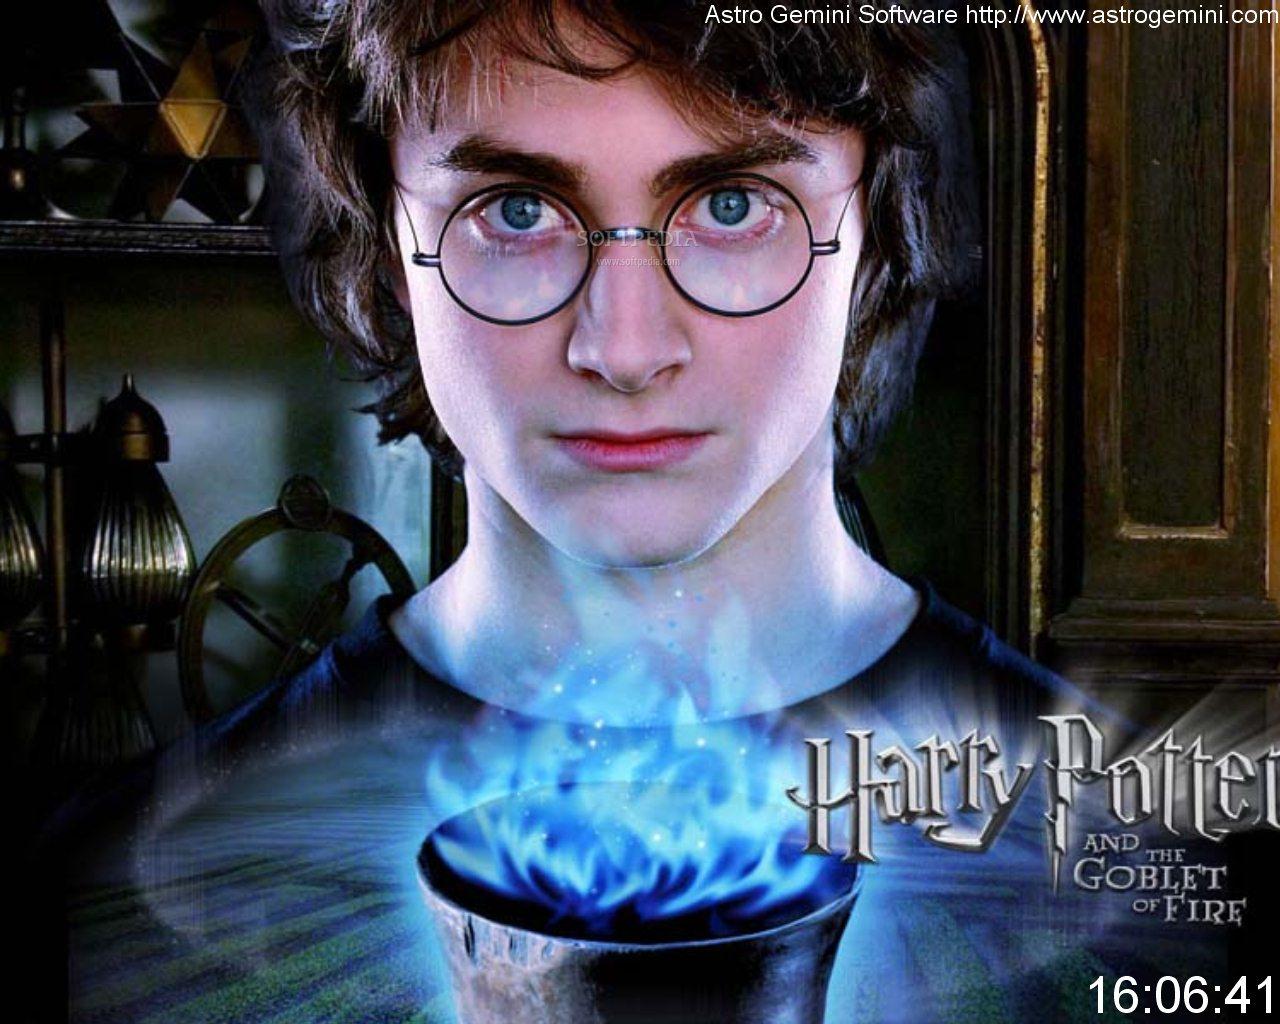 Harry Potter Screensaver 1 FullScreen 1280x1024